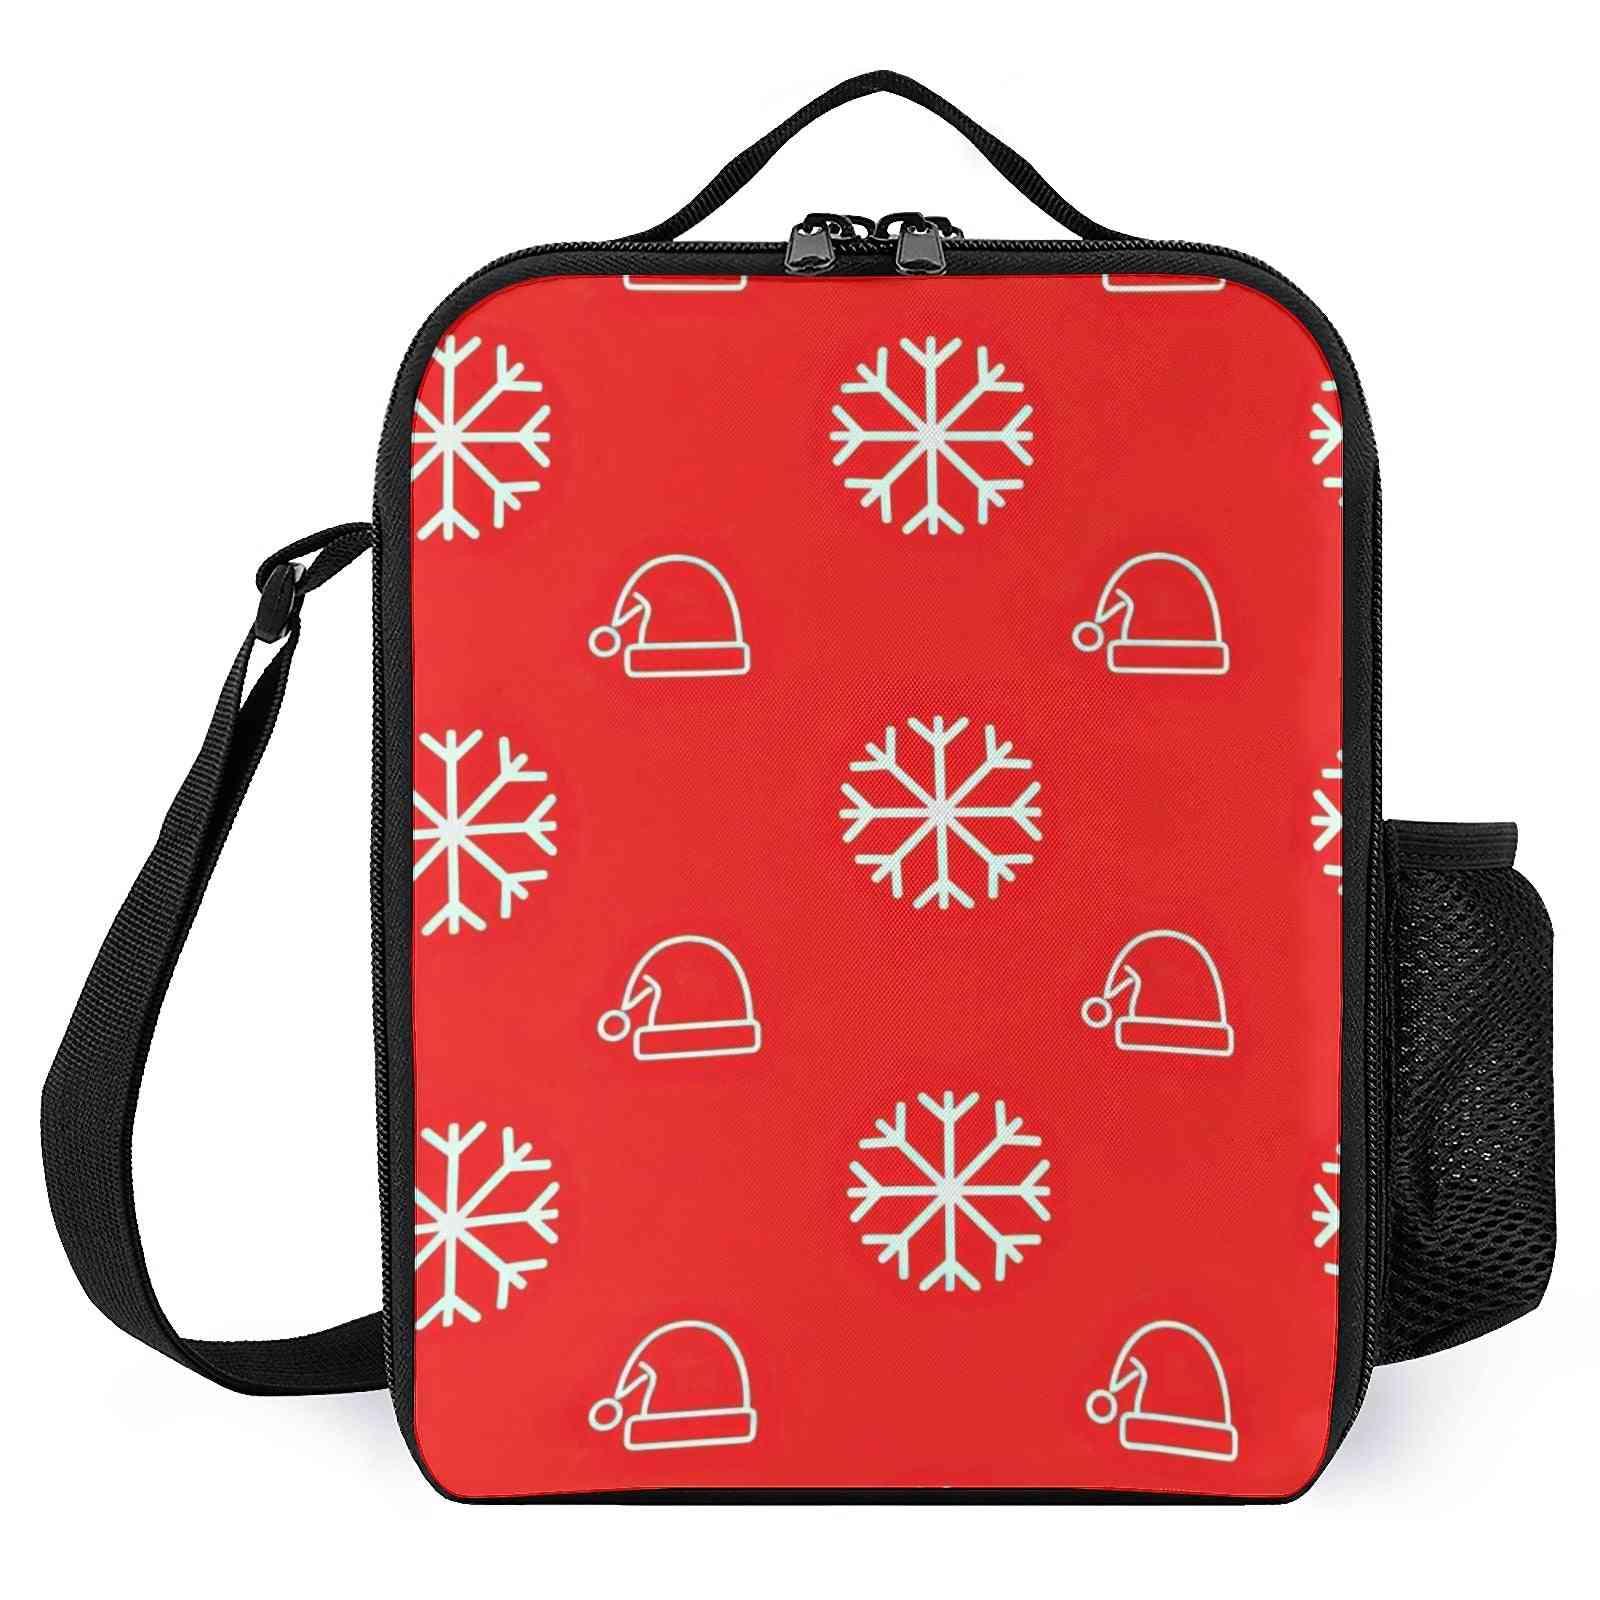 Snowflake And Santa Hat Printed Lunch Bags